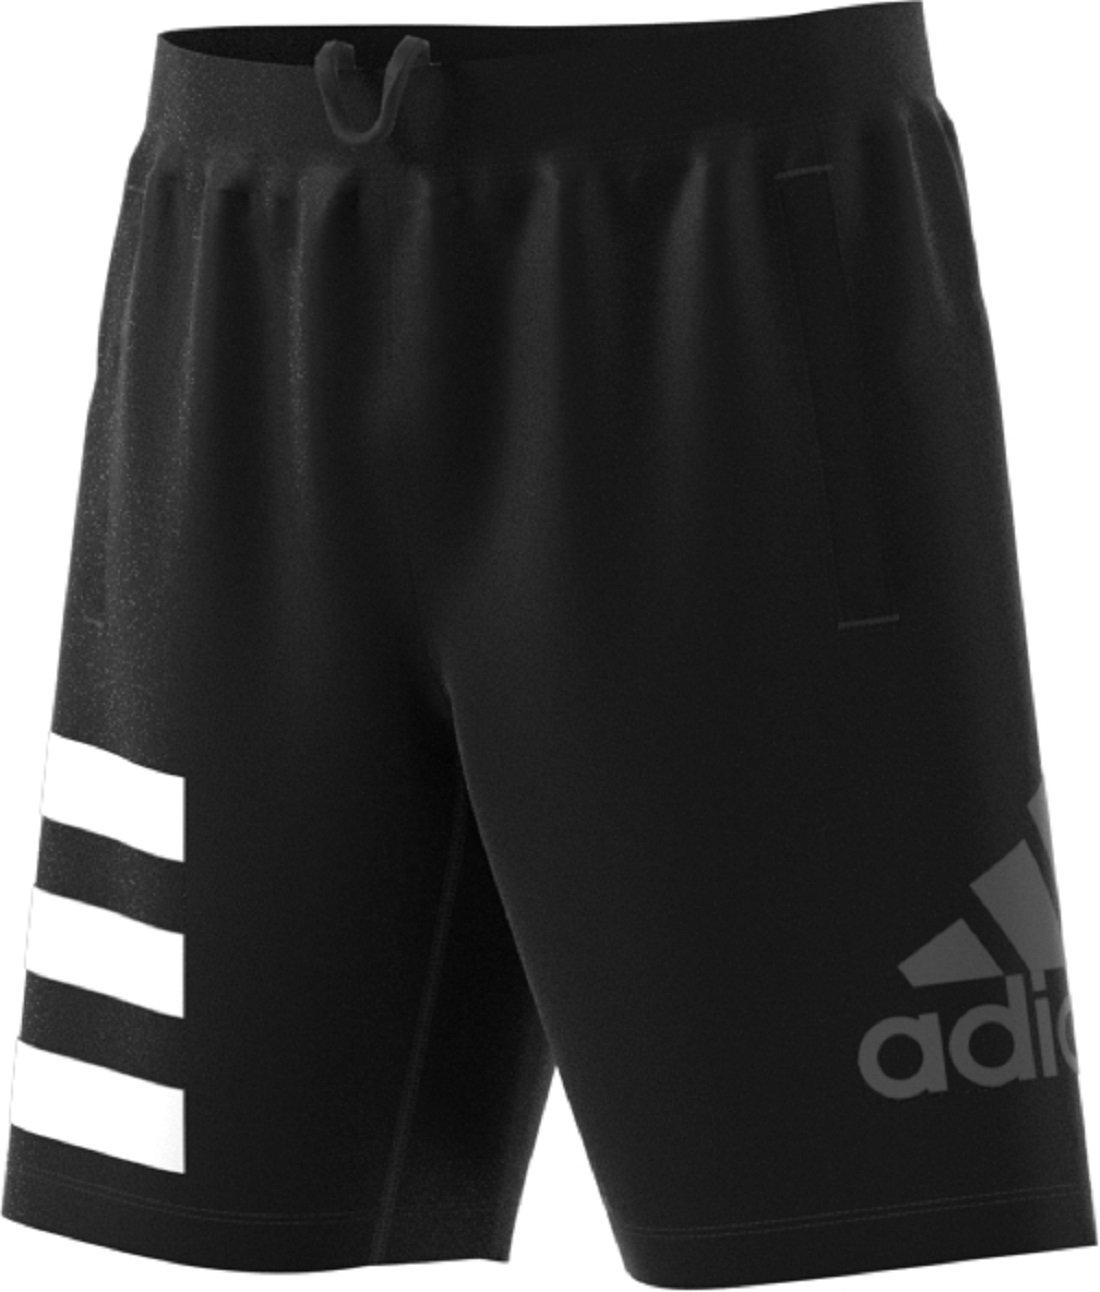 adidas Men's Training Speedbreaker Hype Icon